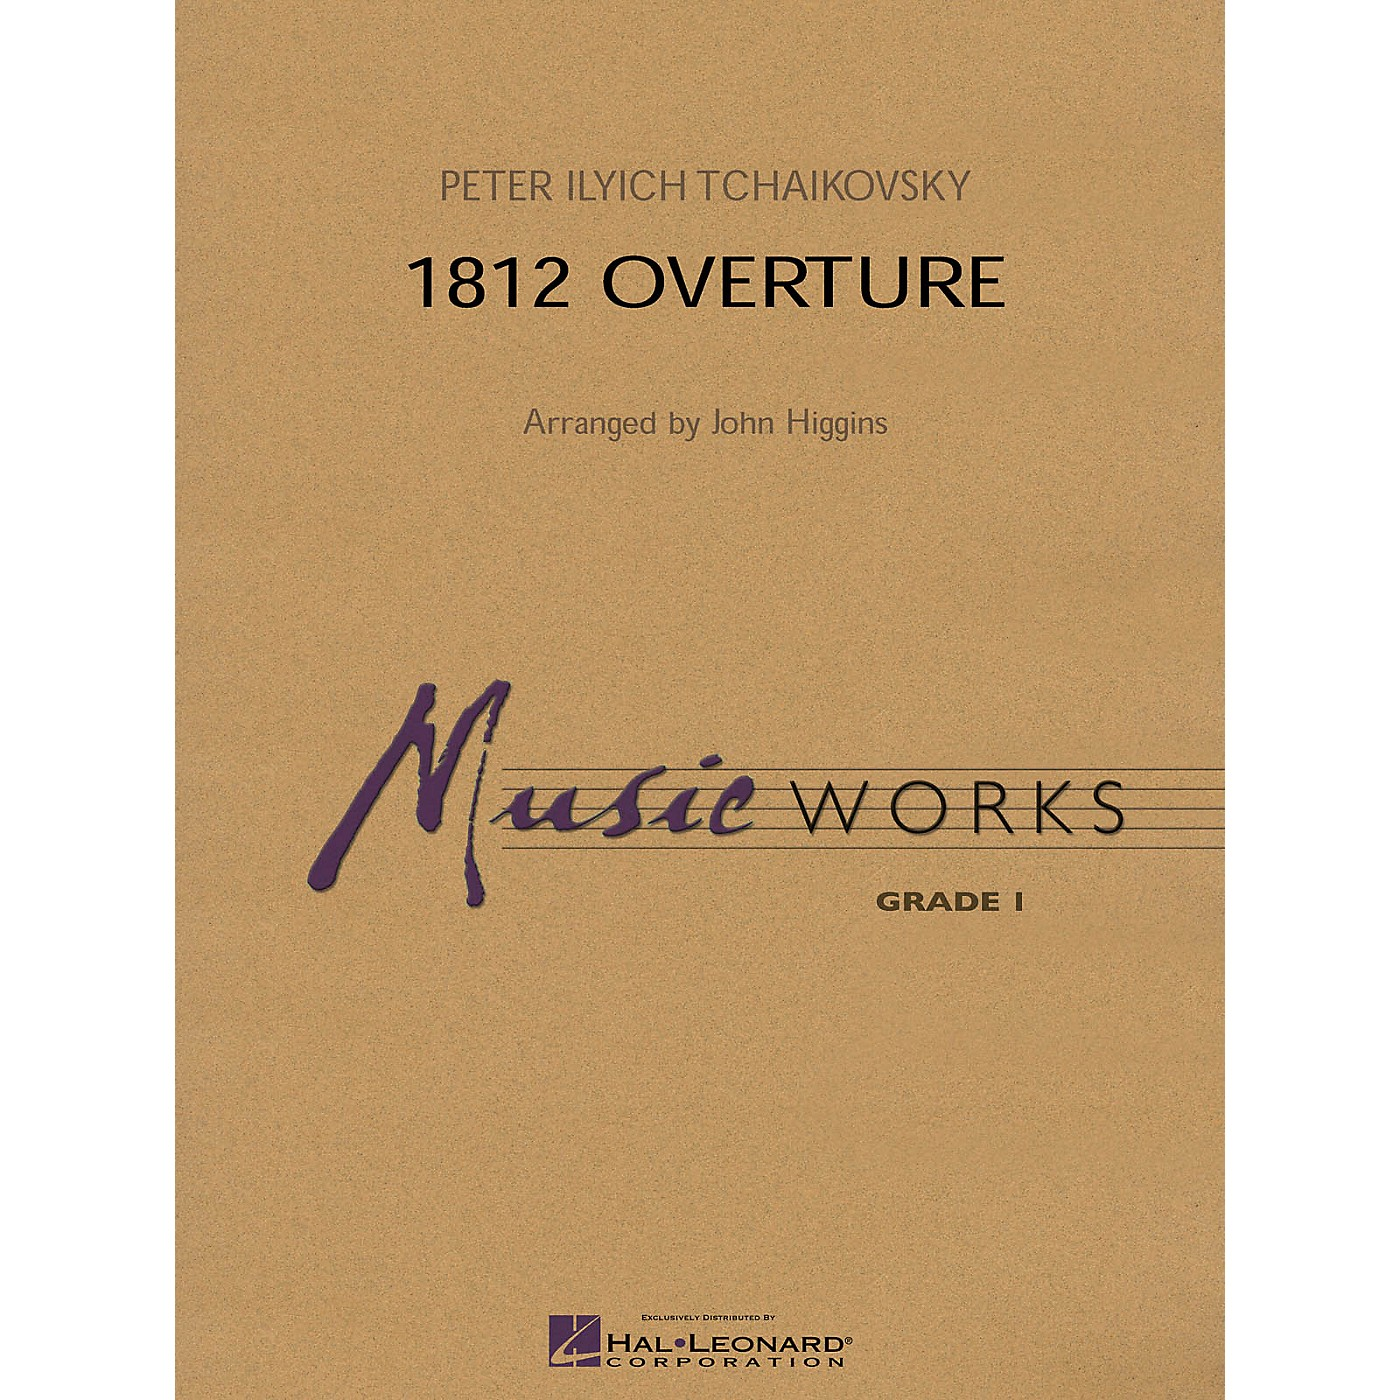 Hal Leonard 1812 Overture Concert Band Level 1 Arranged by John Higgins thumbnail